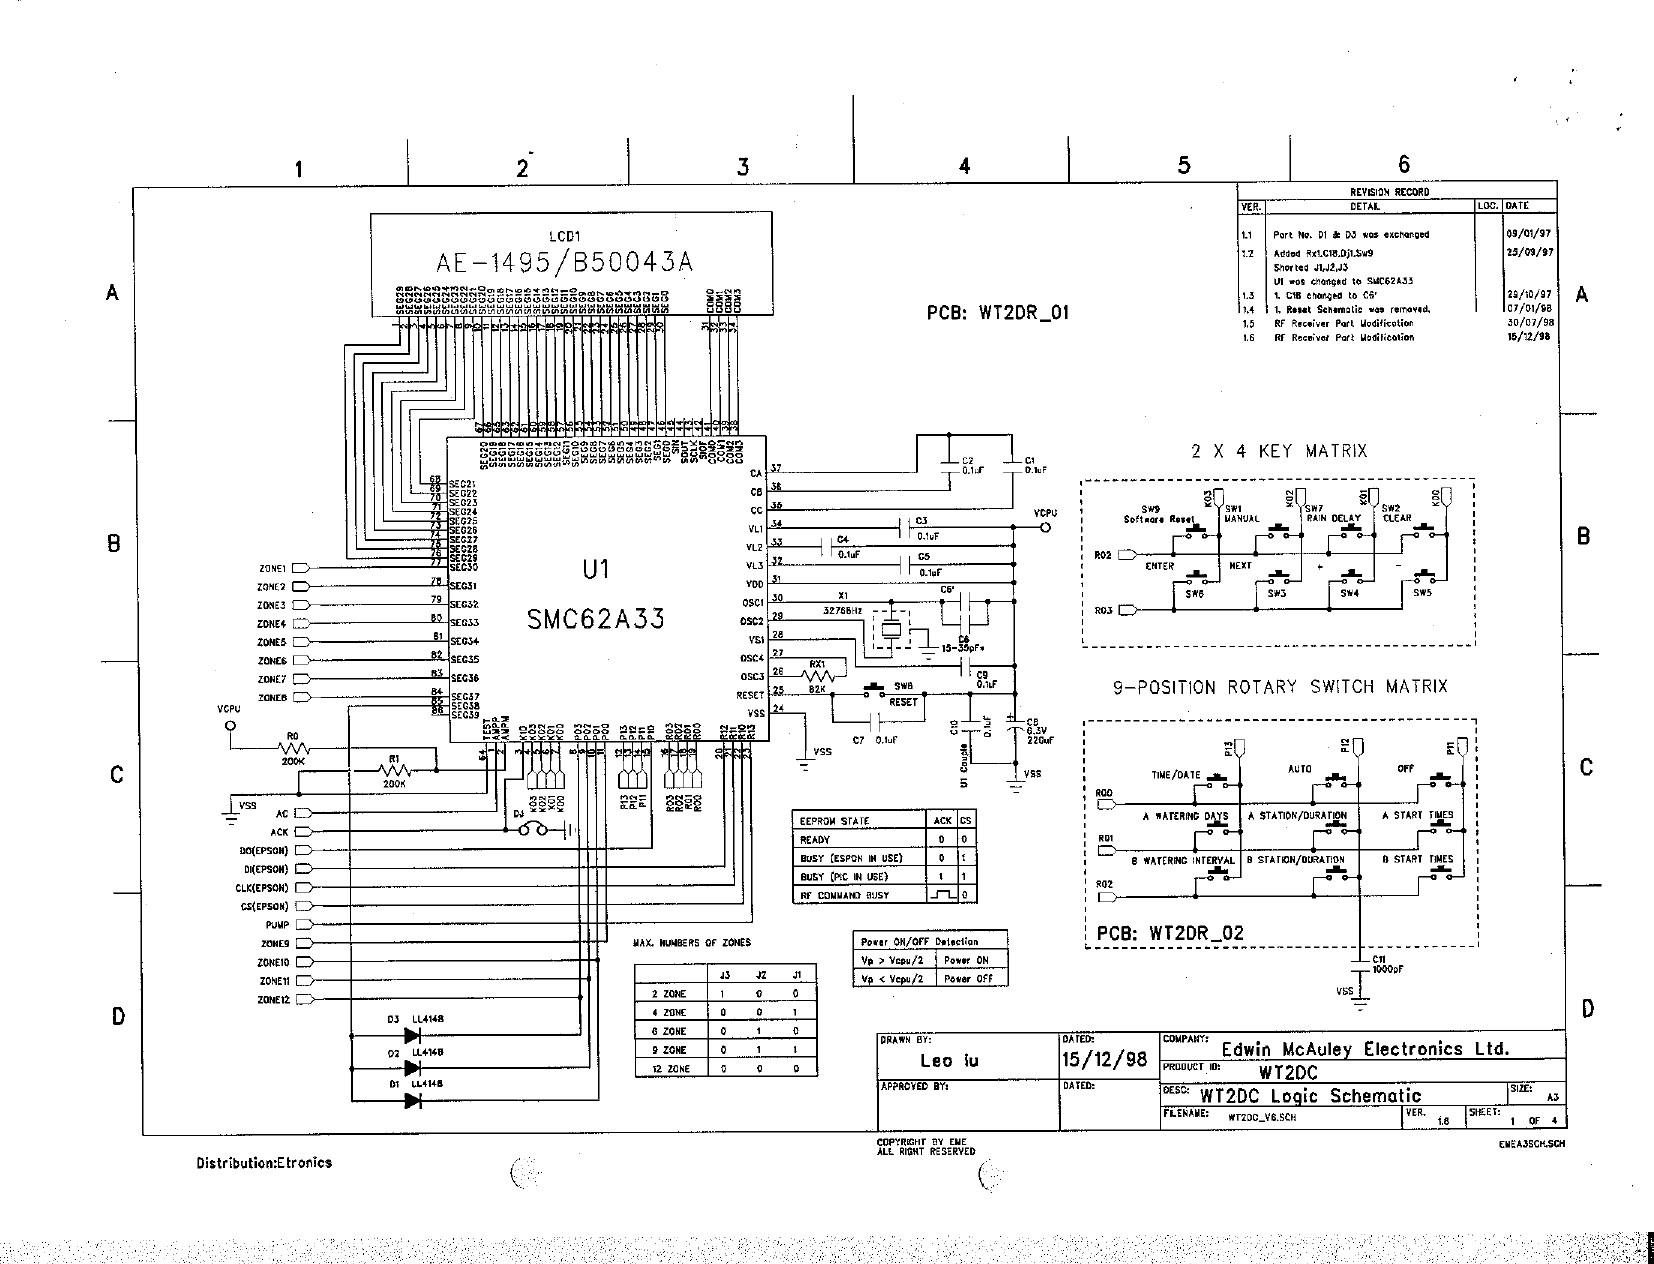 Orbit Pump Relay Wiring Diagram Dg 3891] orbit Controller Wiring Diagram Wiring Diagram Of Orbit Pump Relay Wiring Diagram